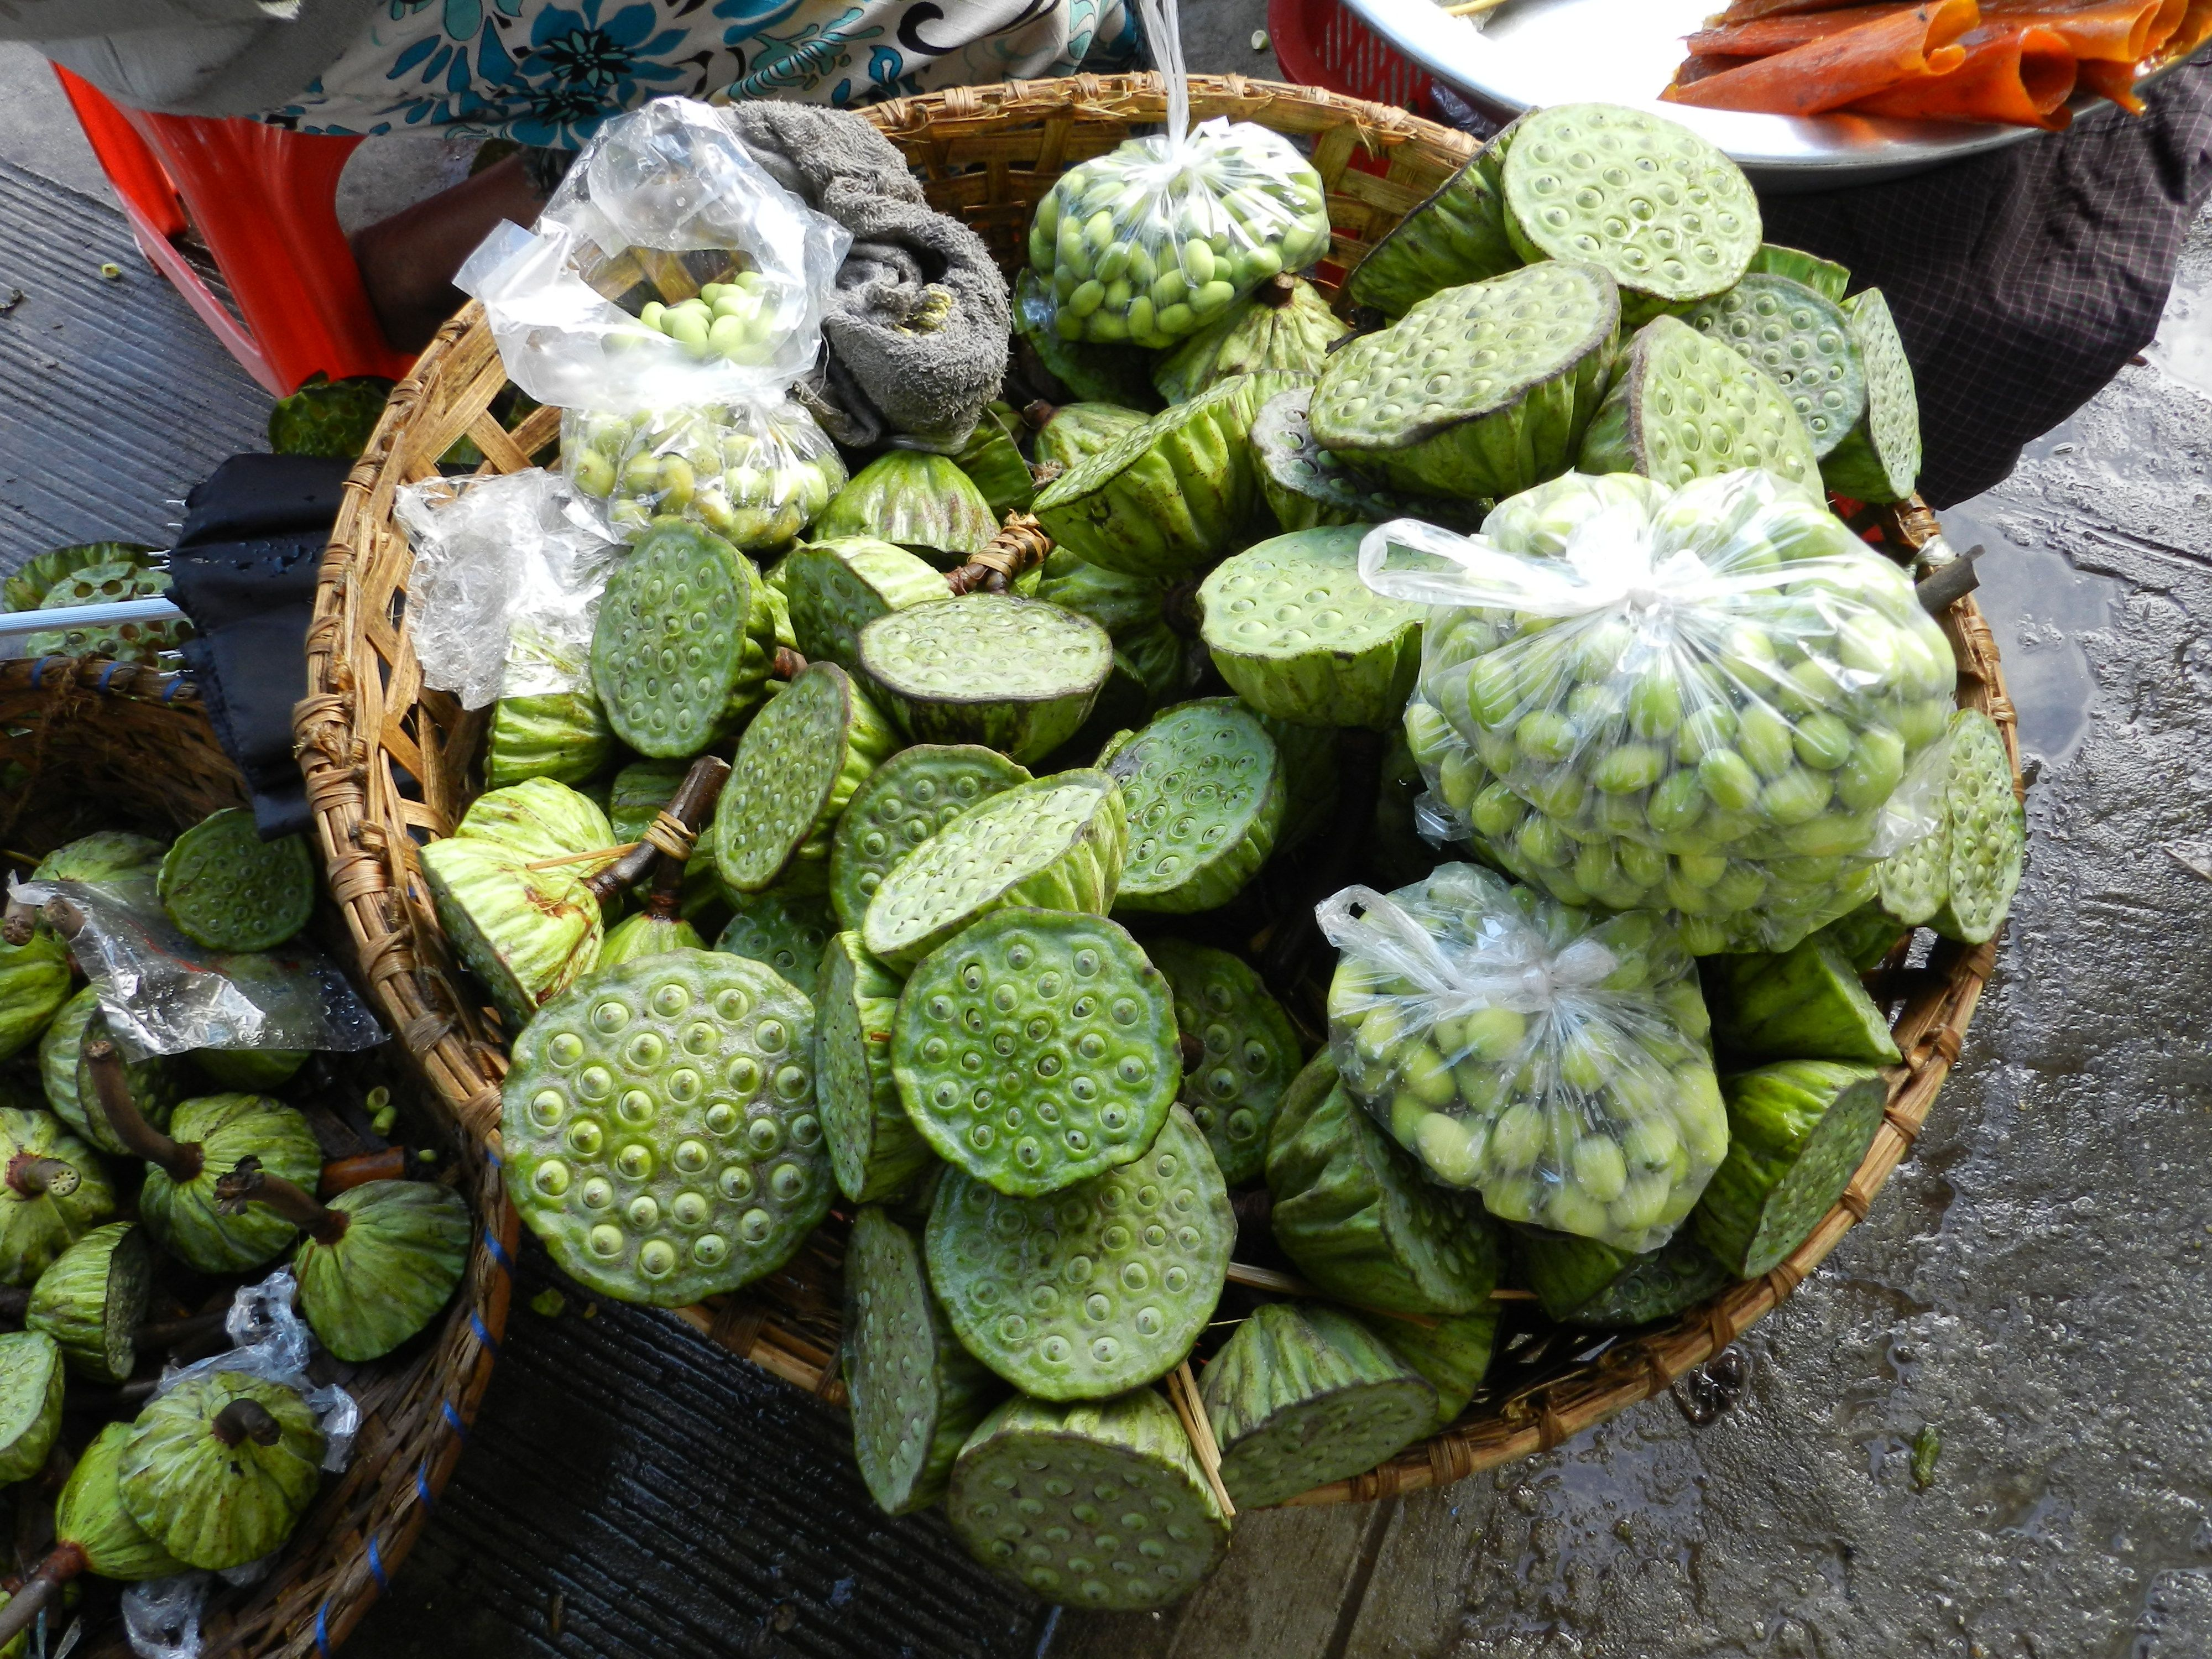 Street food in Yangon Myanmar Rangoon Burma My photo from a